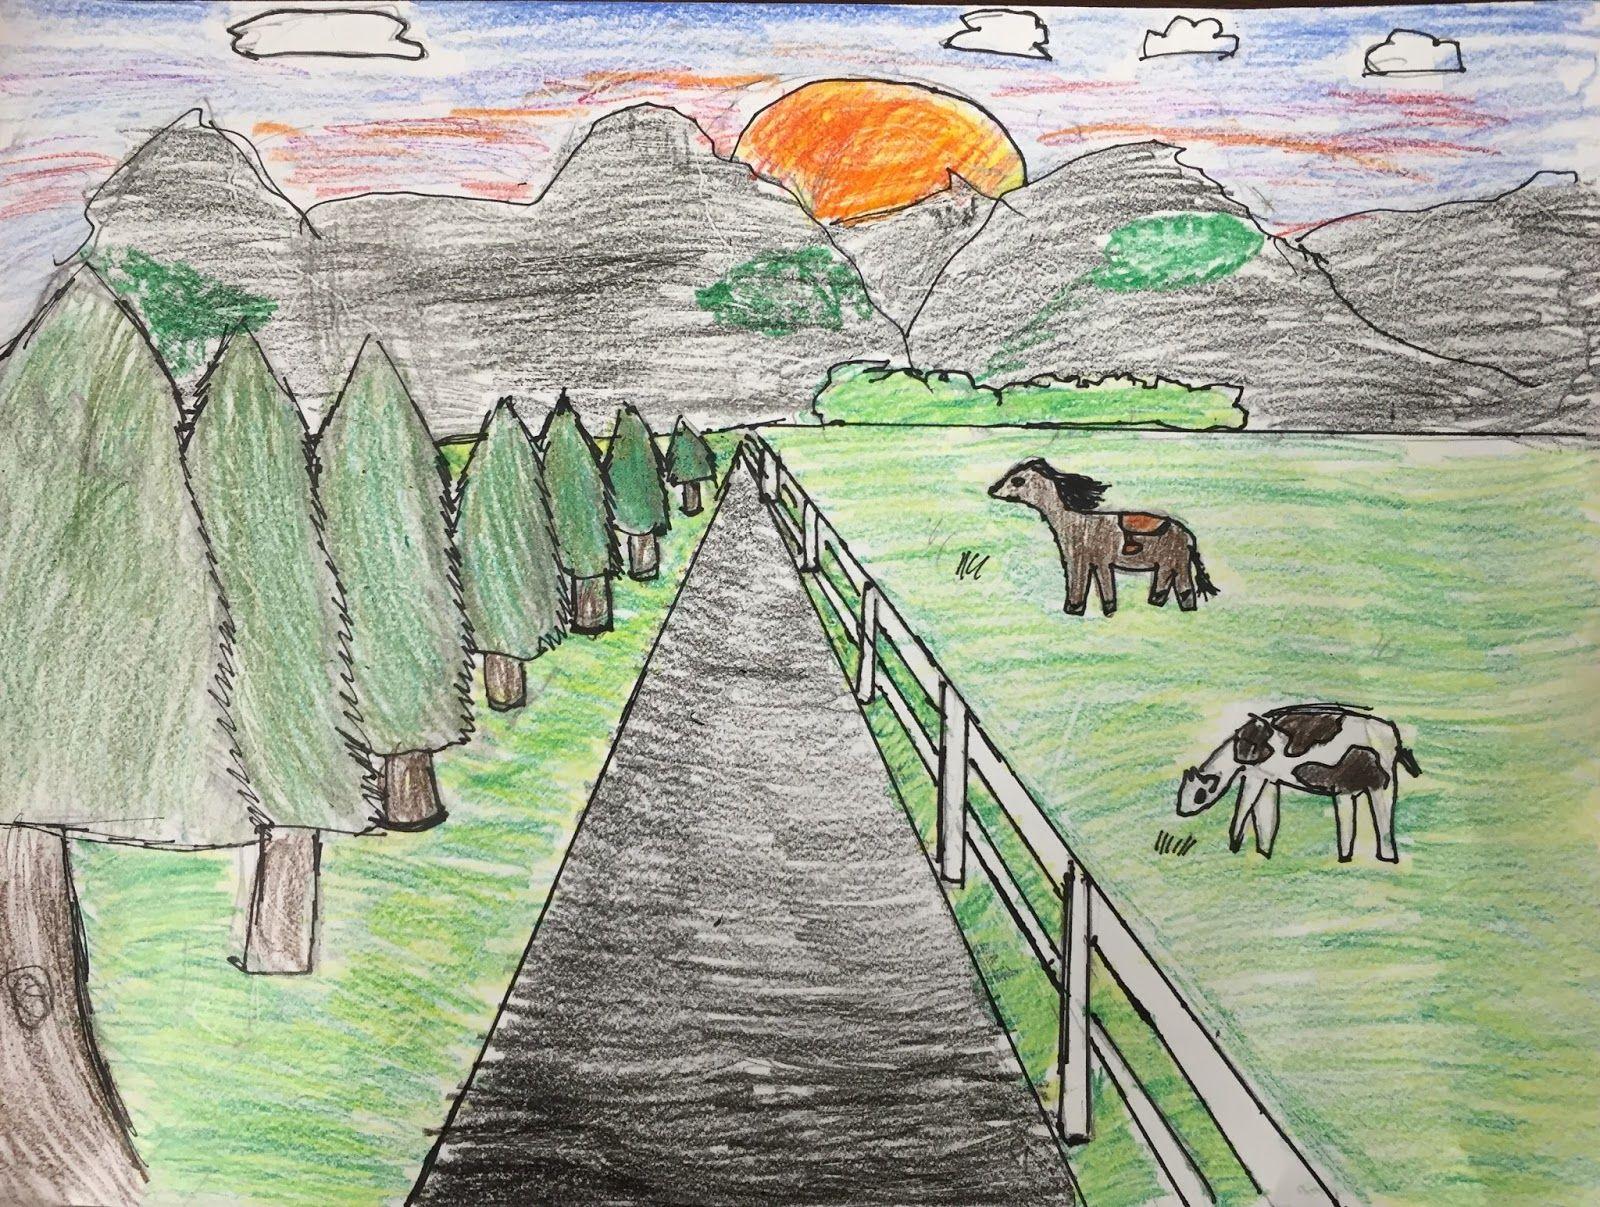 Elementi Della Camera Art 5 Grado One Point Perspective Landscapes Perspective Art Landscape Drawings Landscape Art Lessons